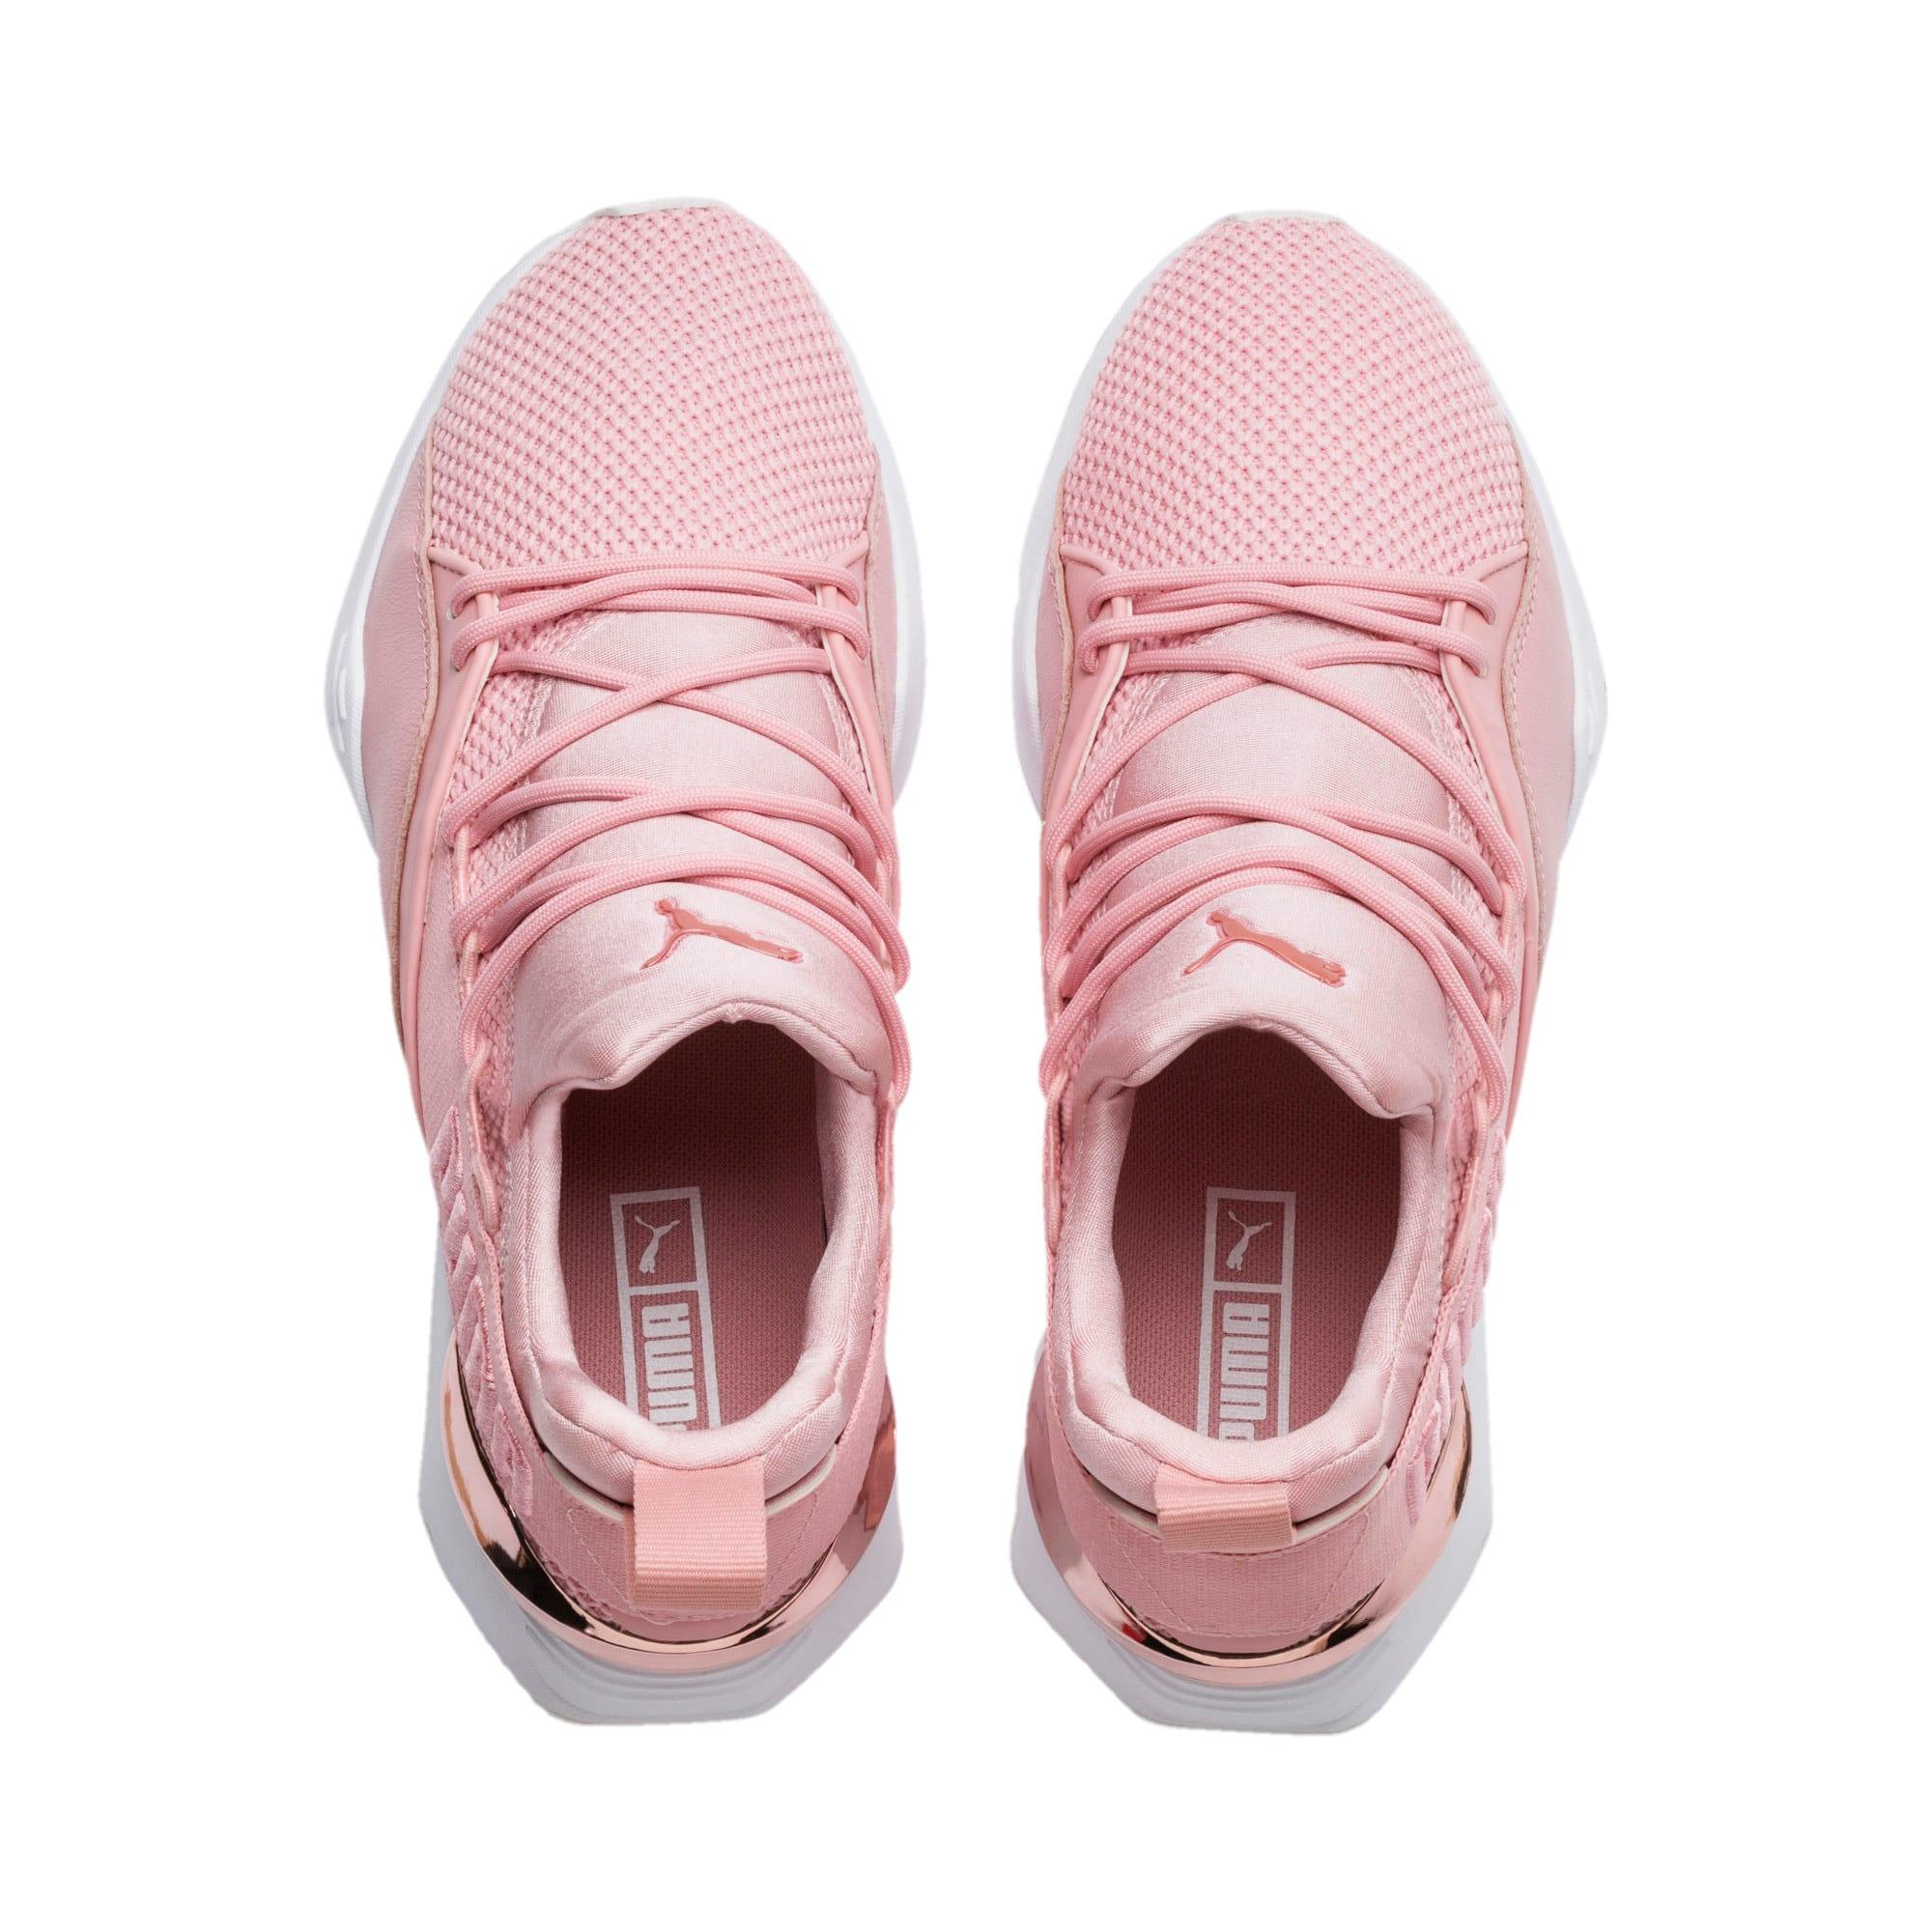 Thumbnail 6 of Muse Maia Metallic Rose Women's Sneakers, Bridal Rose-Rose Gold, medium